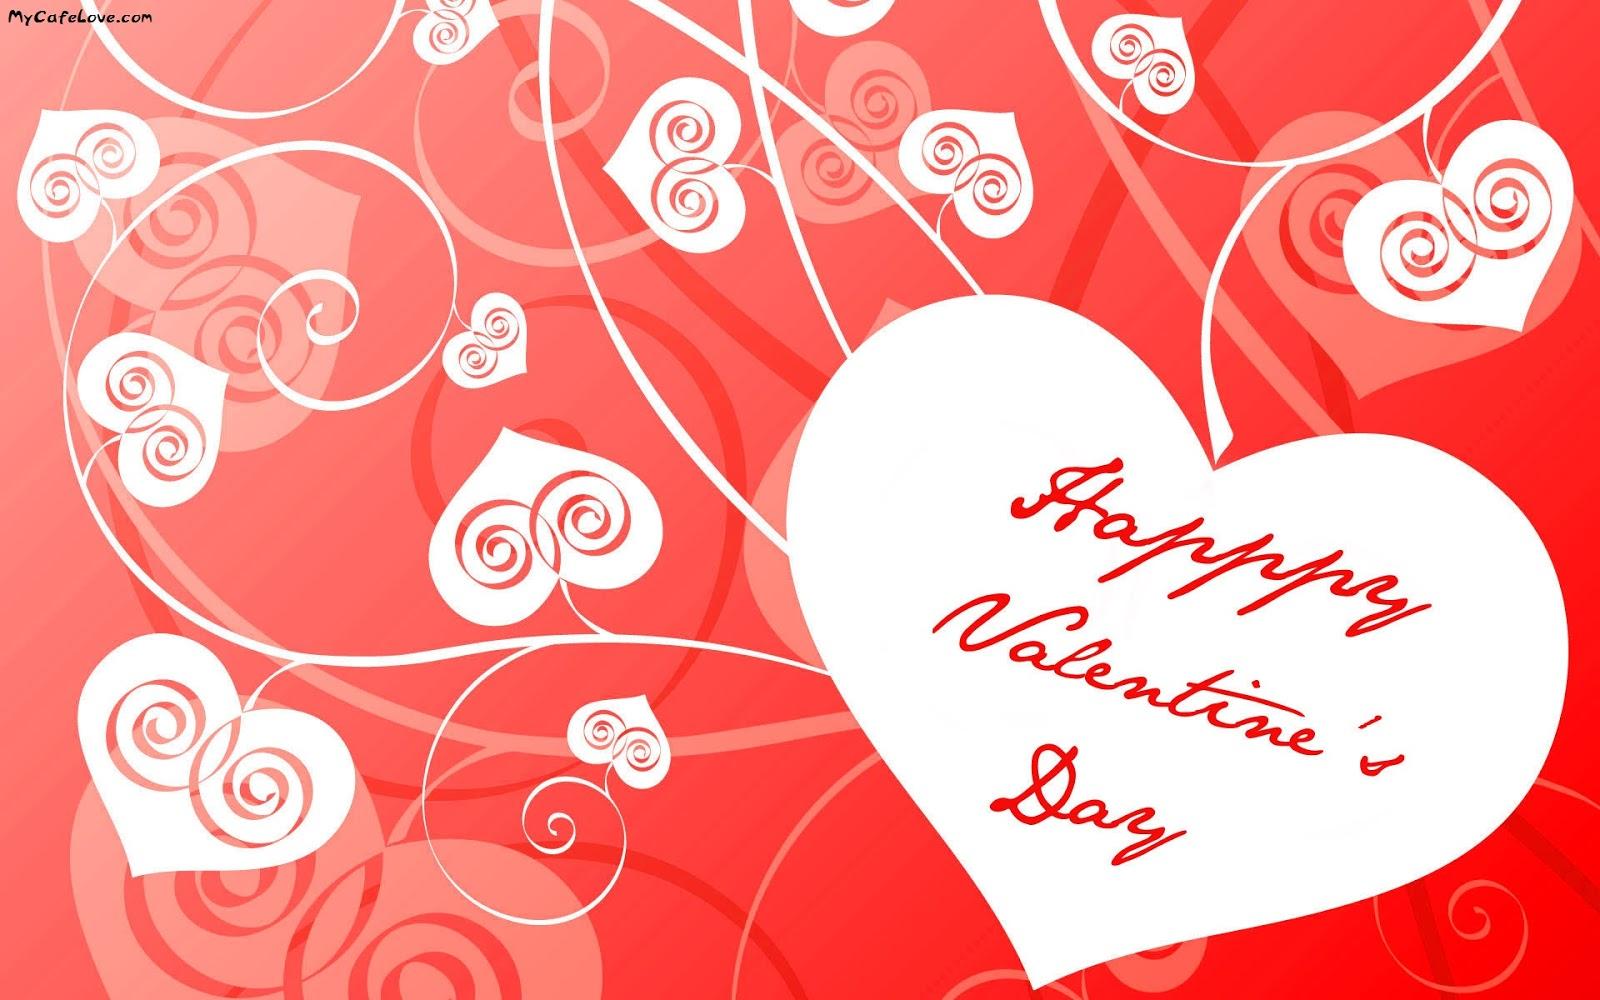 http://4.bp.blogspot.com/-6309L77NOjc/URE0waPP0lI/AAAAAAAAGXs/8PdUuVxXzCM/s1600/happy+valentines+day.jpg